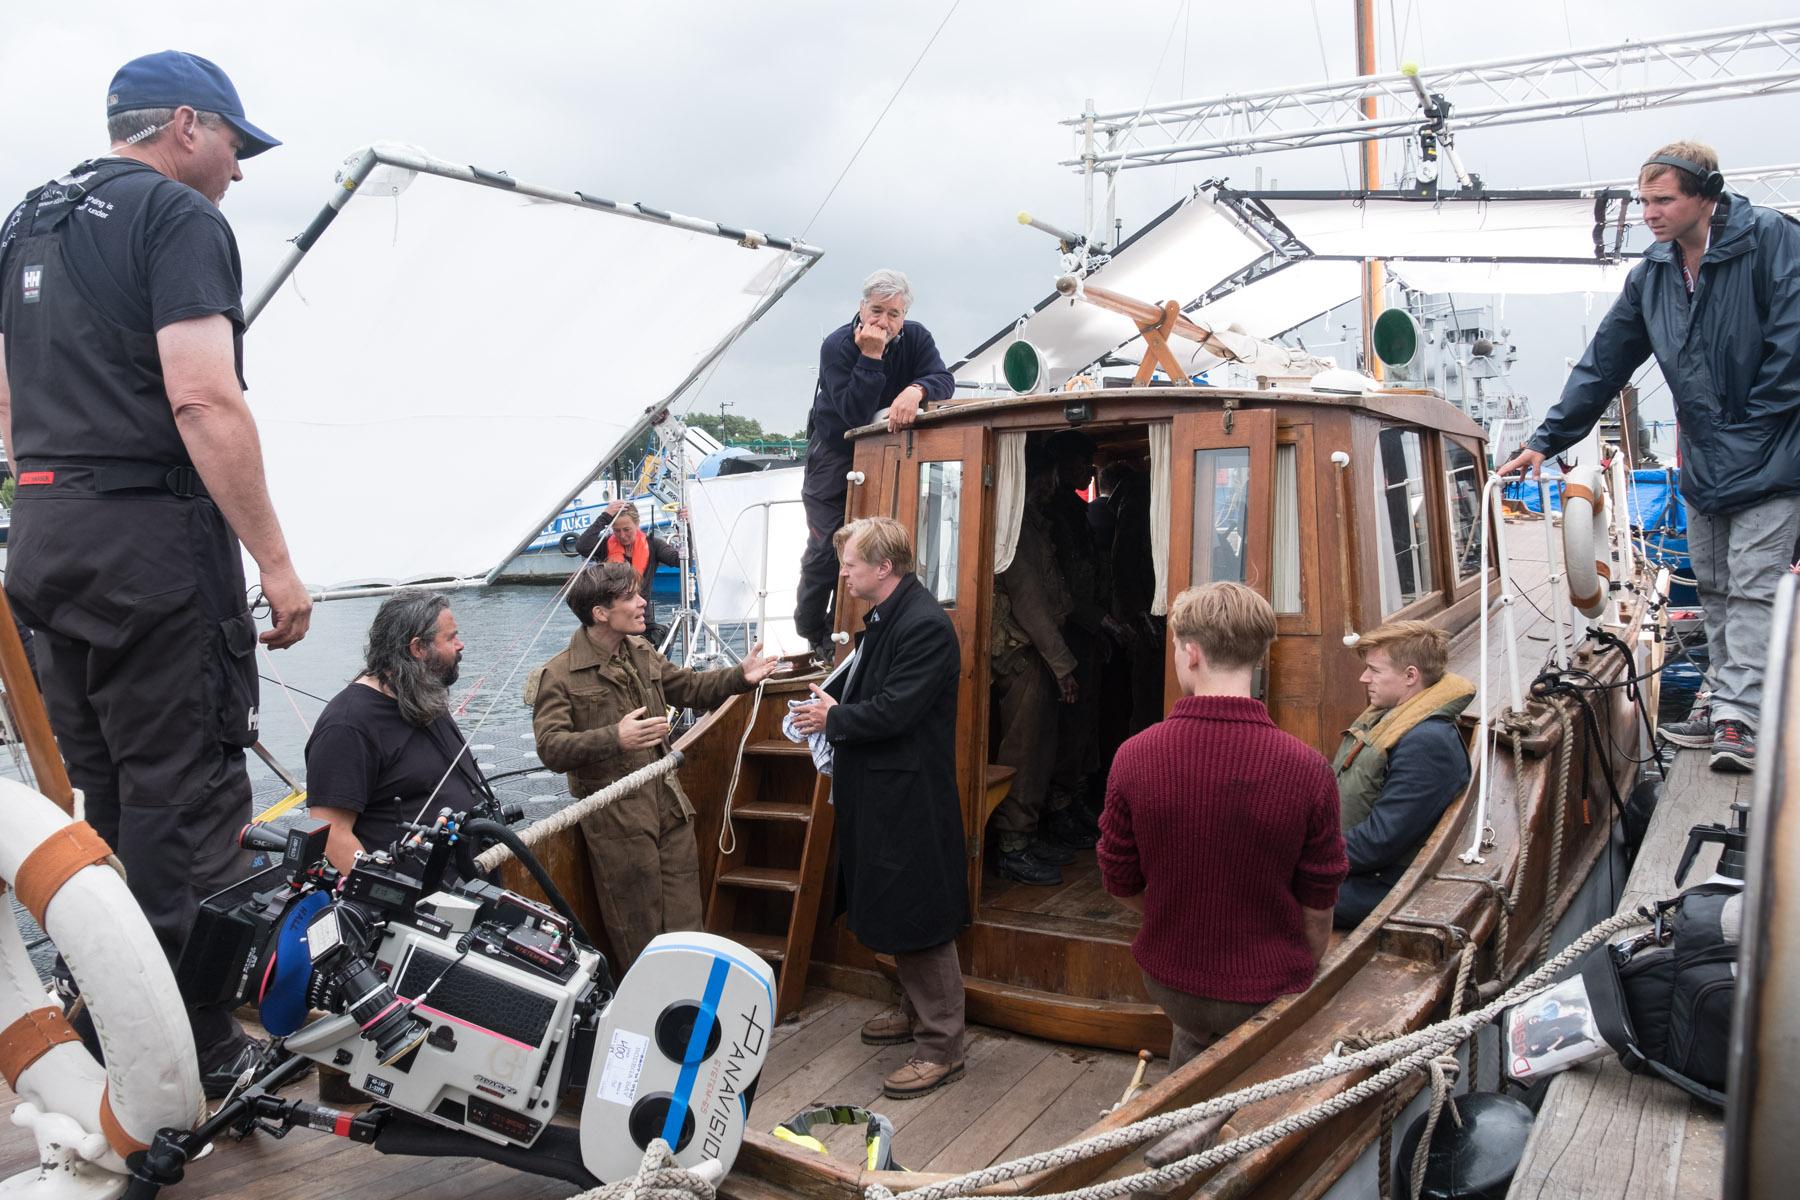 Influencers: Christopher Nolan's Team Is the Big-Budget, Practical-Filmmaking Alternative